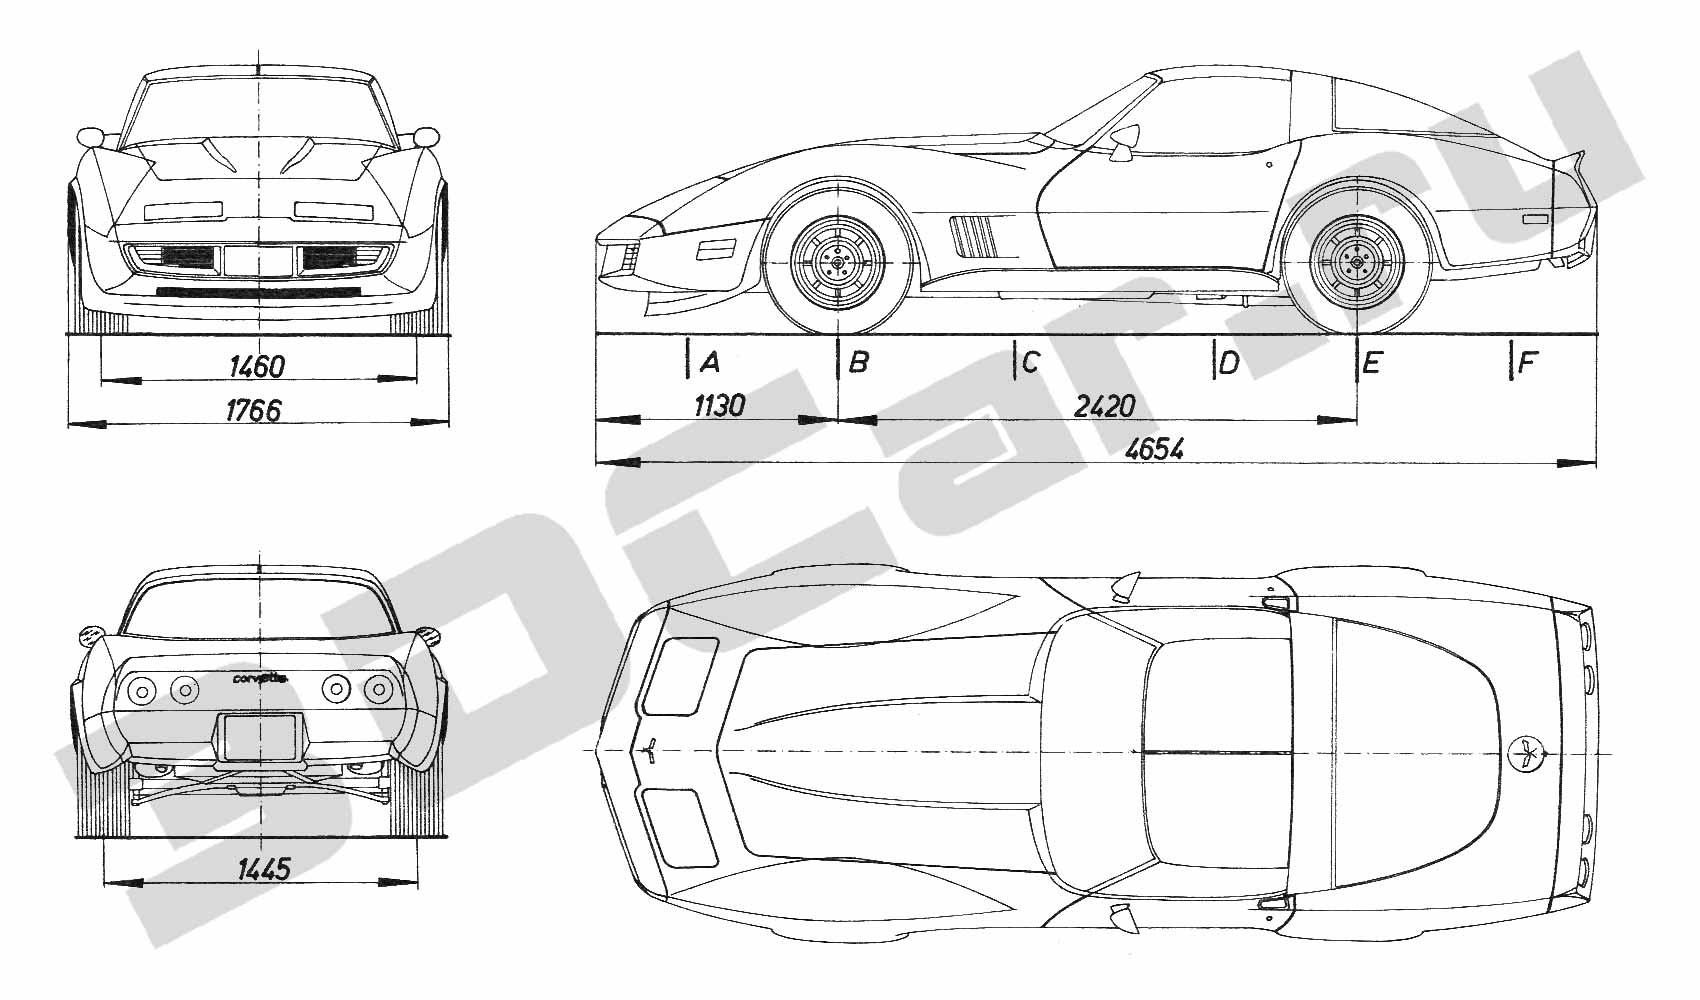 Chevrolet Corvette Blueprint Images